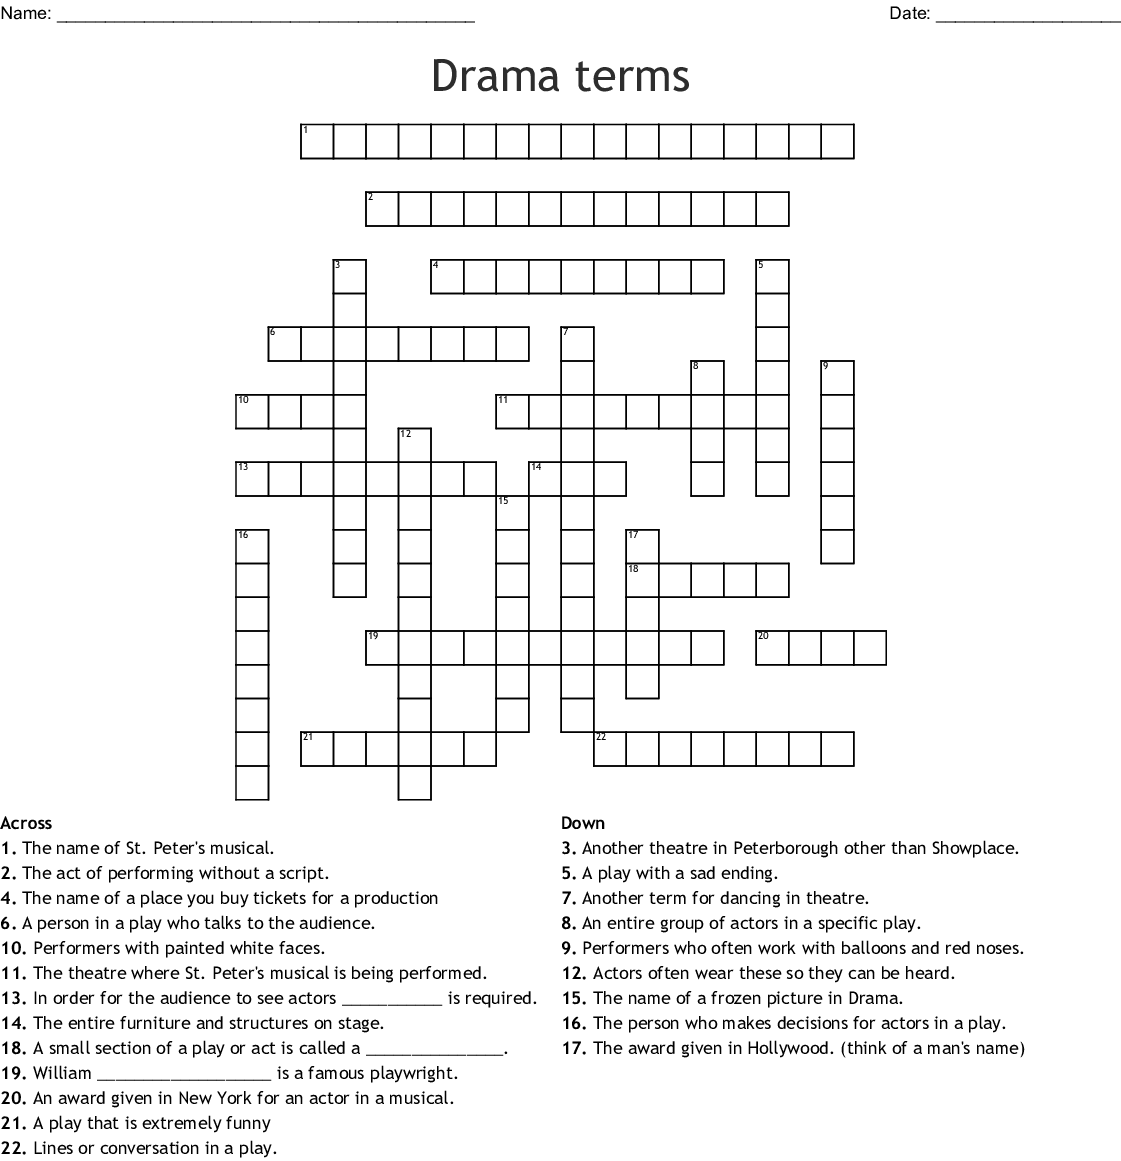 Drama terms Crossword - WordMint